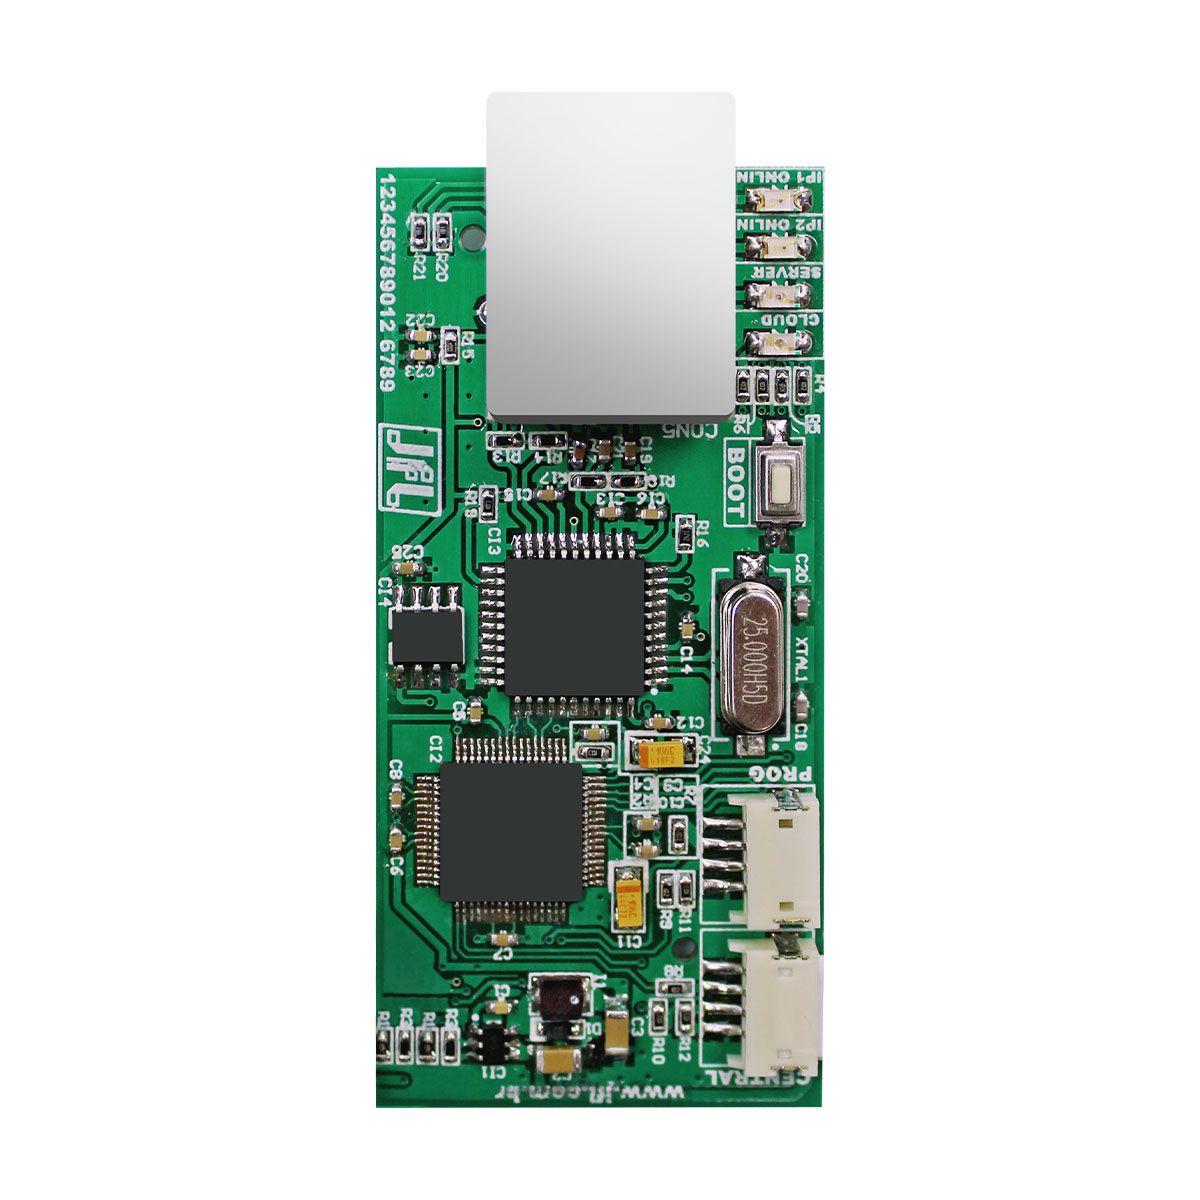 Kit Alarme Smart Cloud 18 Jfl Com Sensores Idx 1001 Jfl